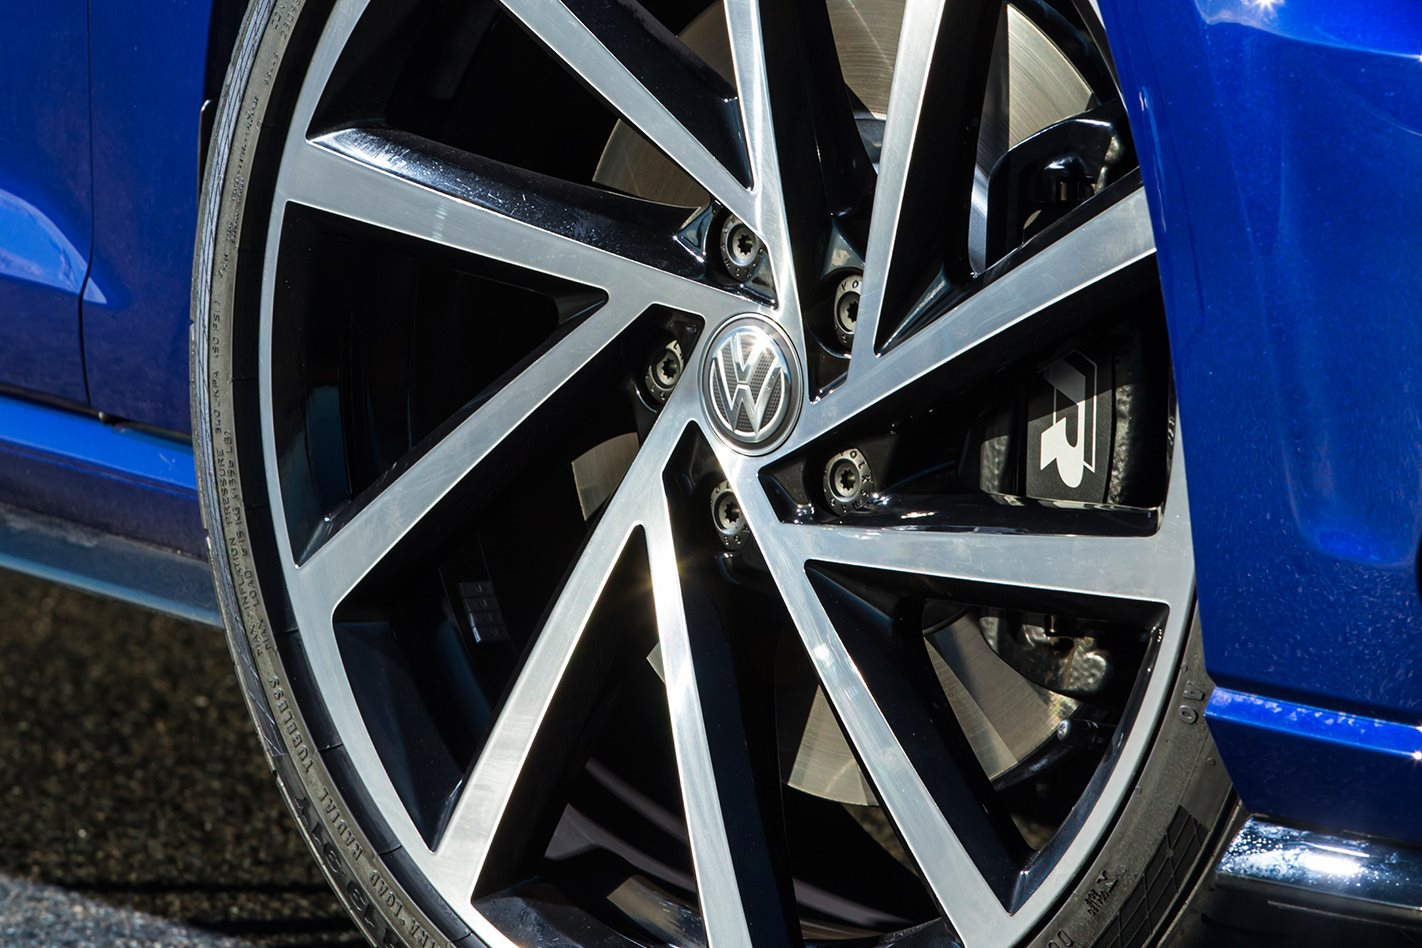 2017 Volkswagen Golf R 7.5 wheel.jpg